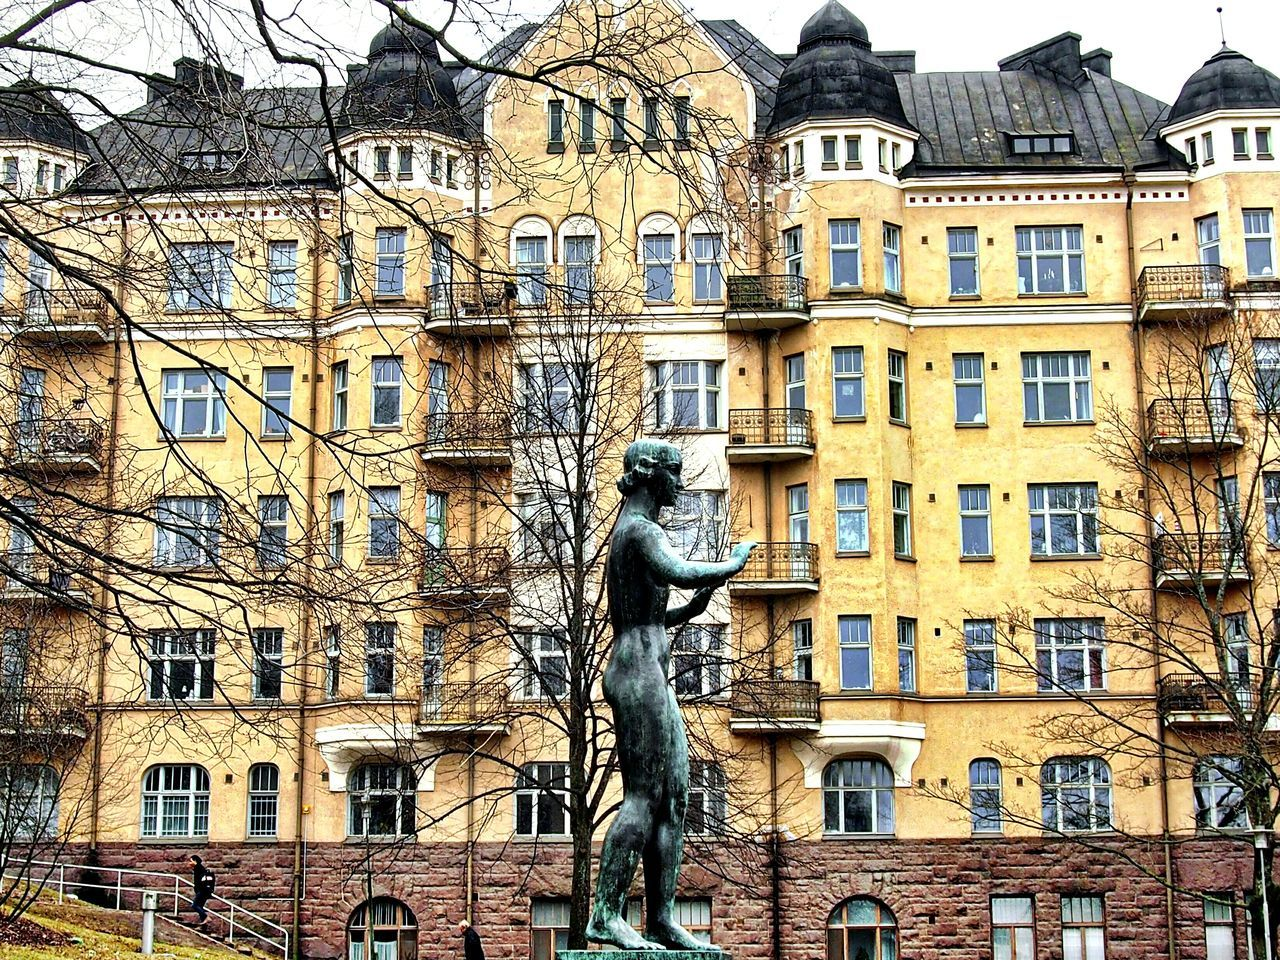 Statue House Architecture Balcony 'builder' Viktor Jansson 1931 Father Of Tove Jansson Scenery Streetshot Helsinki Kaisaniemi Park Streetshooter